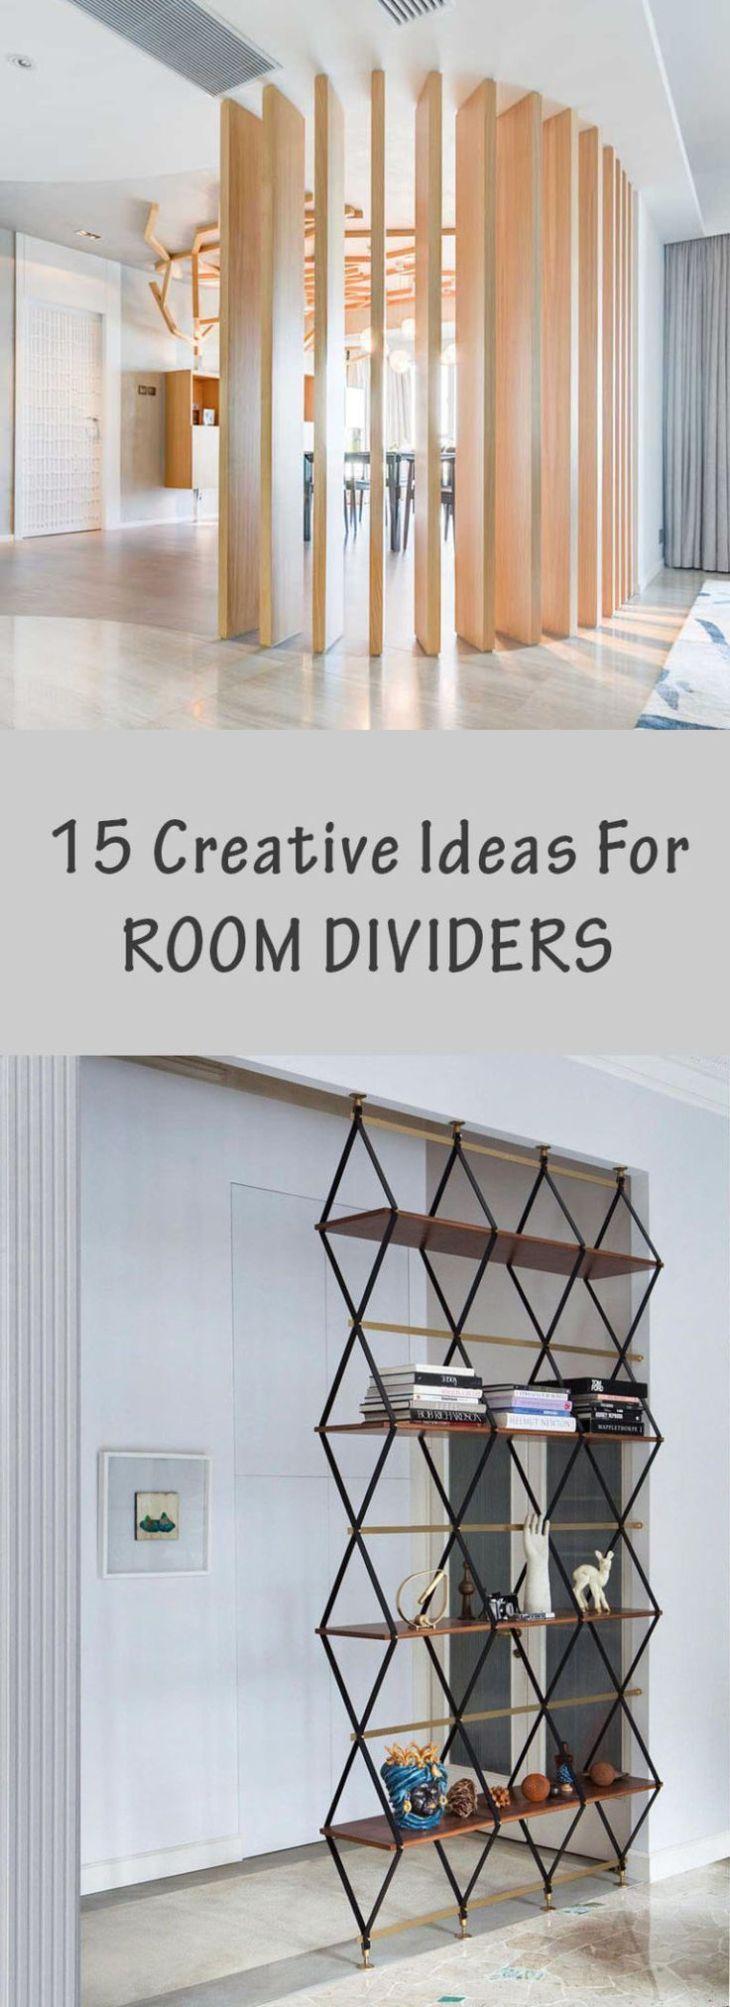 Creative Ideas For Room Dividers DIY Room Divider Ideas